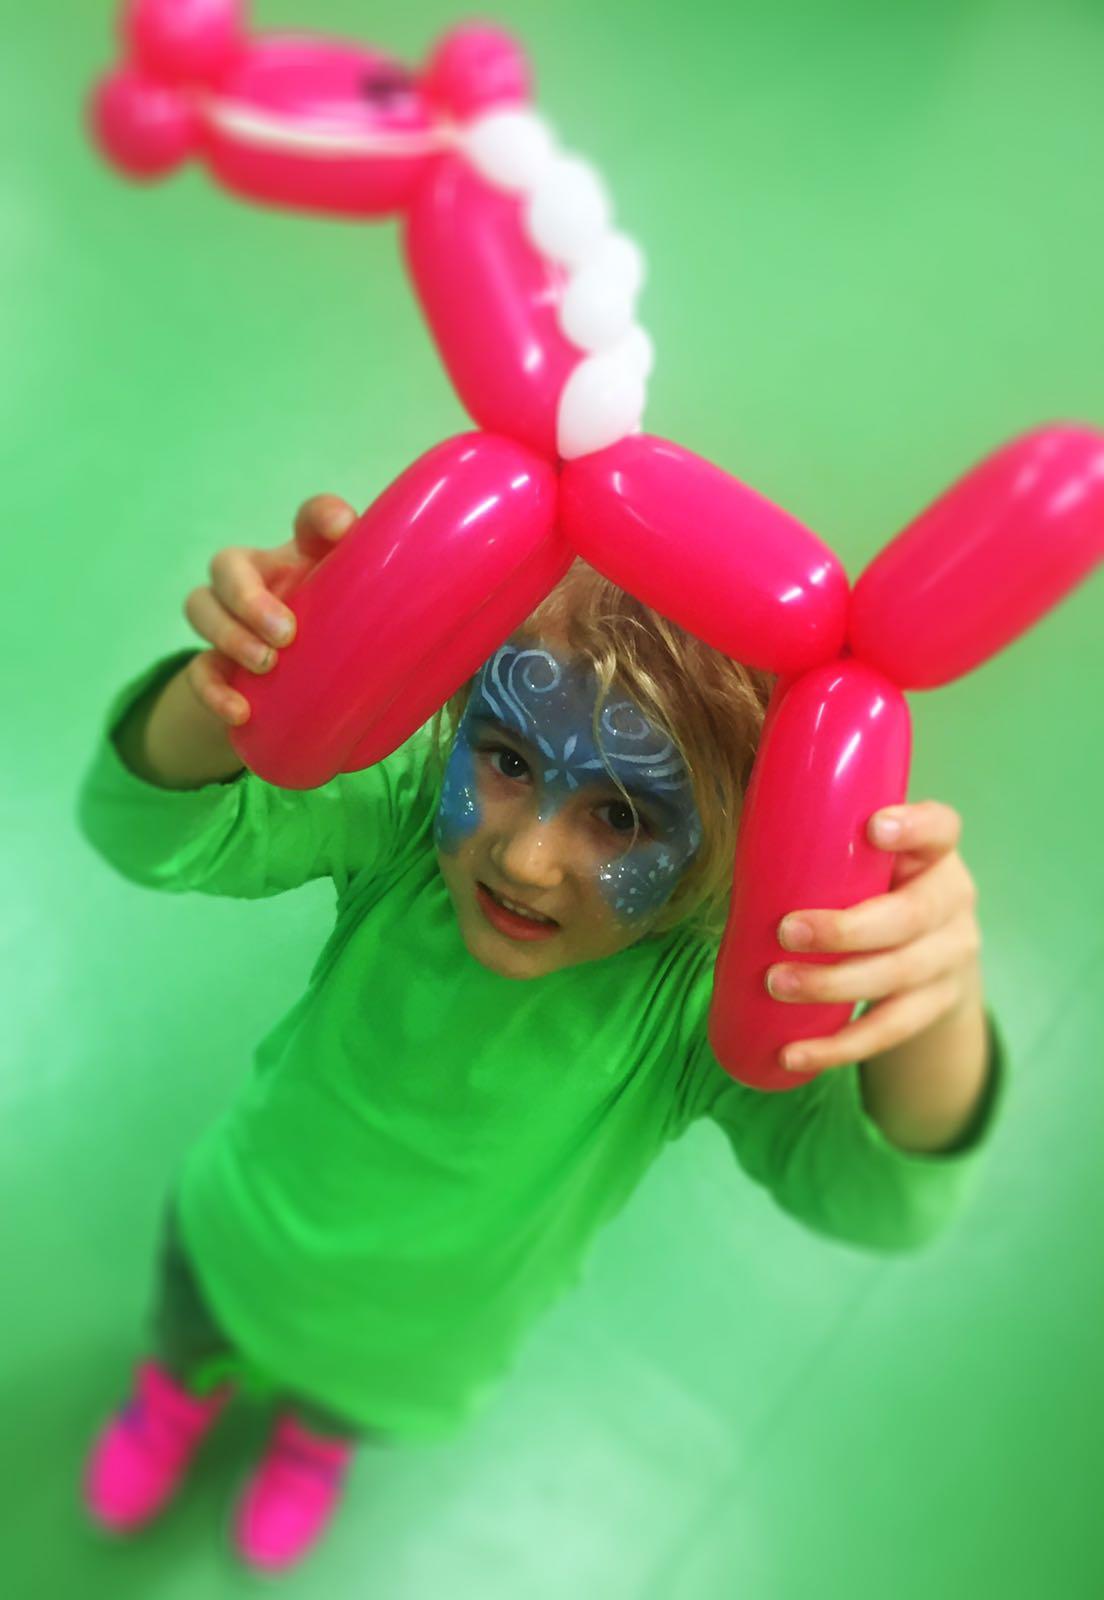 Luftballons Düsseldorf - Kindergeburtstag